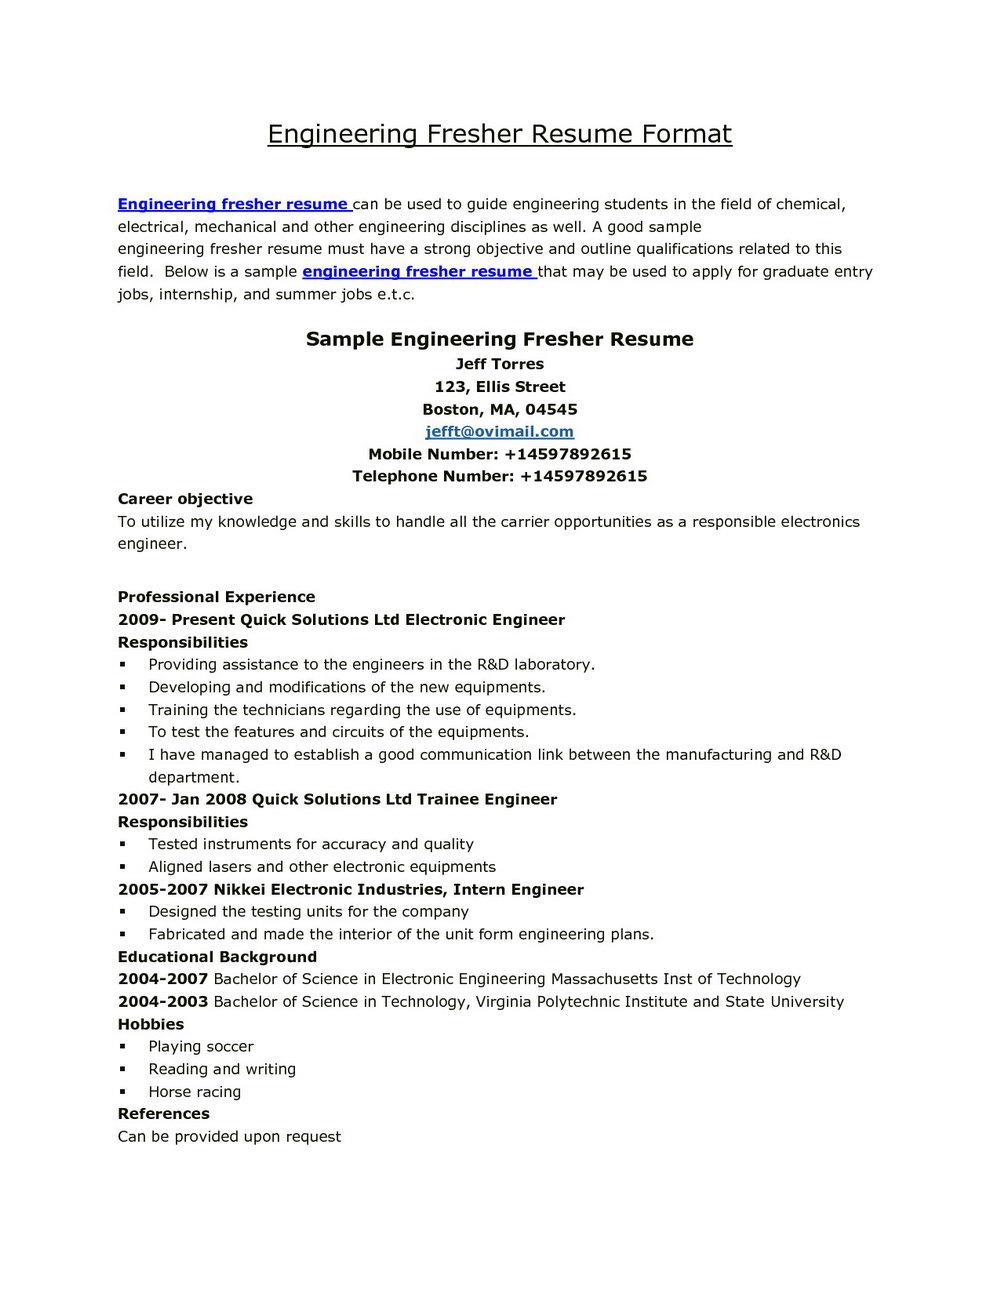 wipro website to upload resume